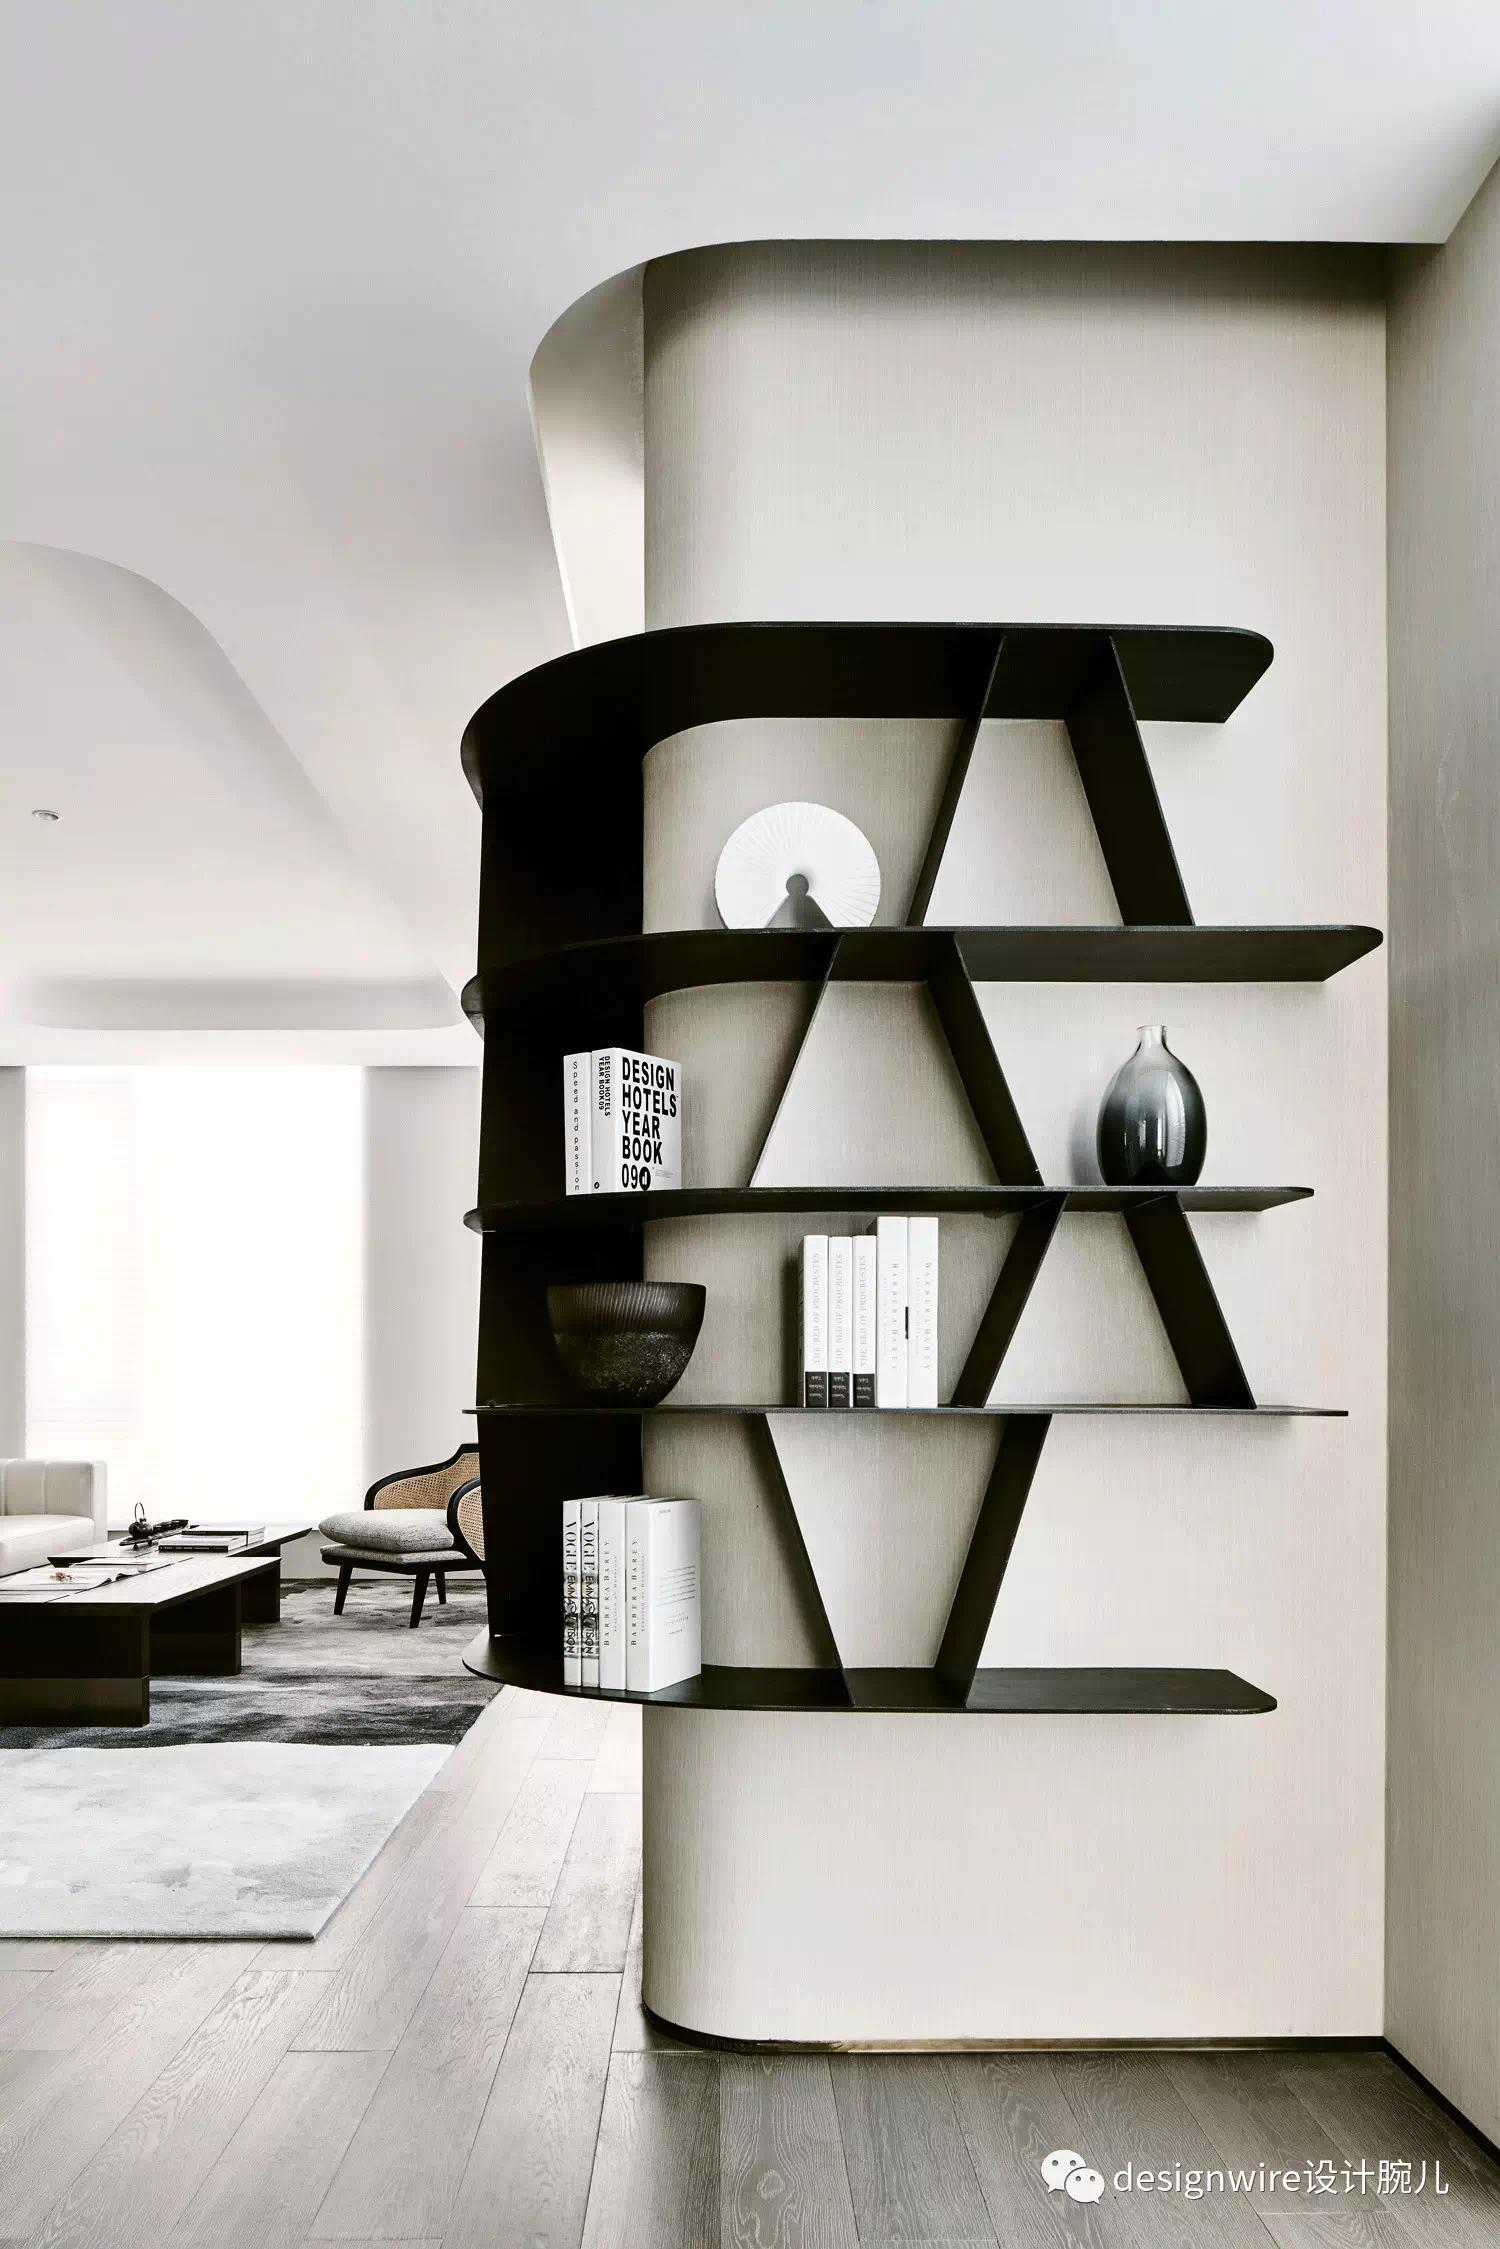 Pin By Mod Wood Art On Zhanshi Bangong Interior Shelving Design